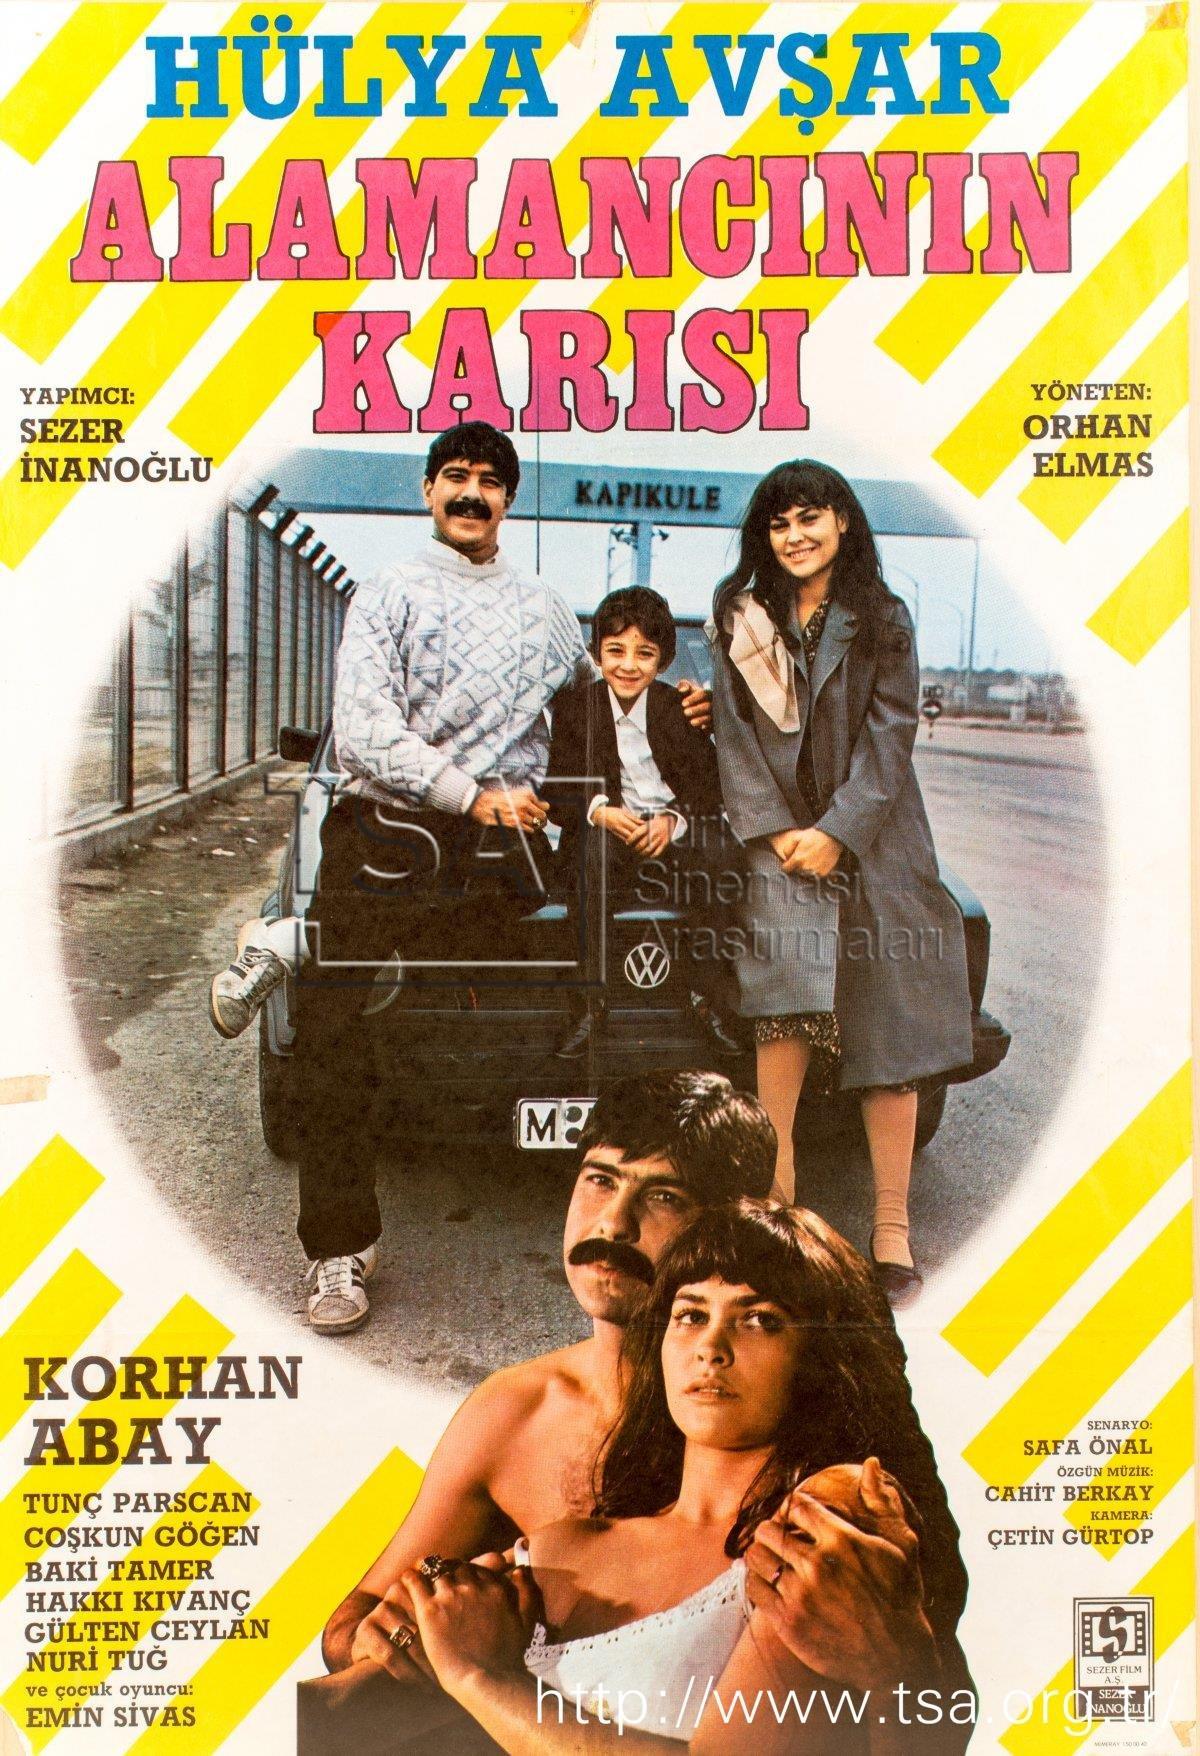 Alamancinin karisi ((1987))